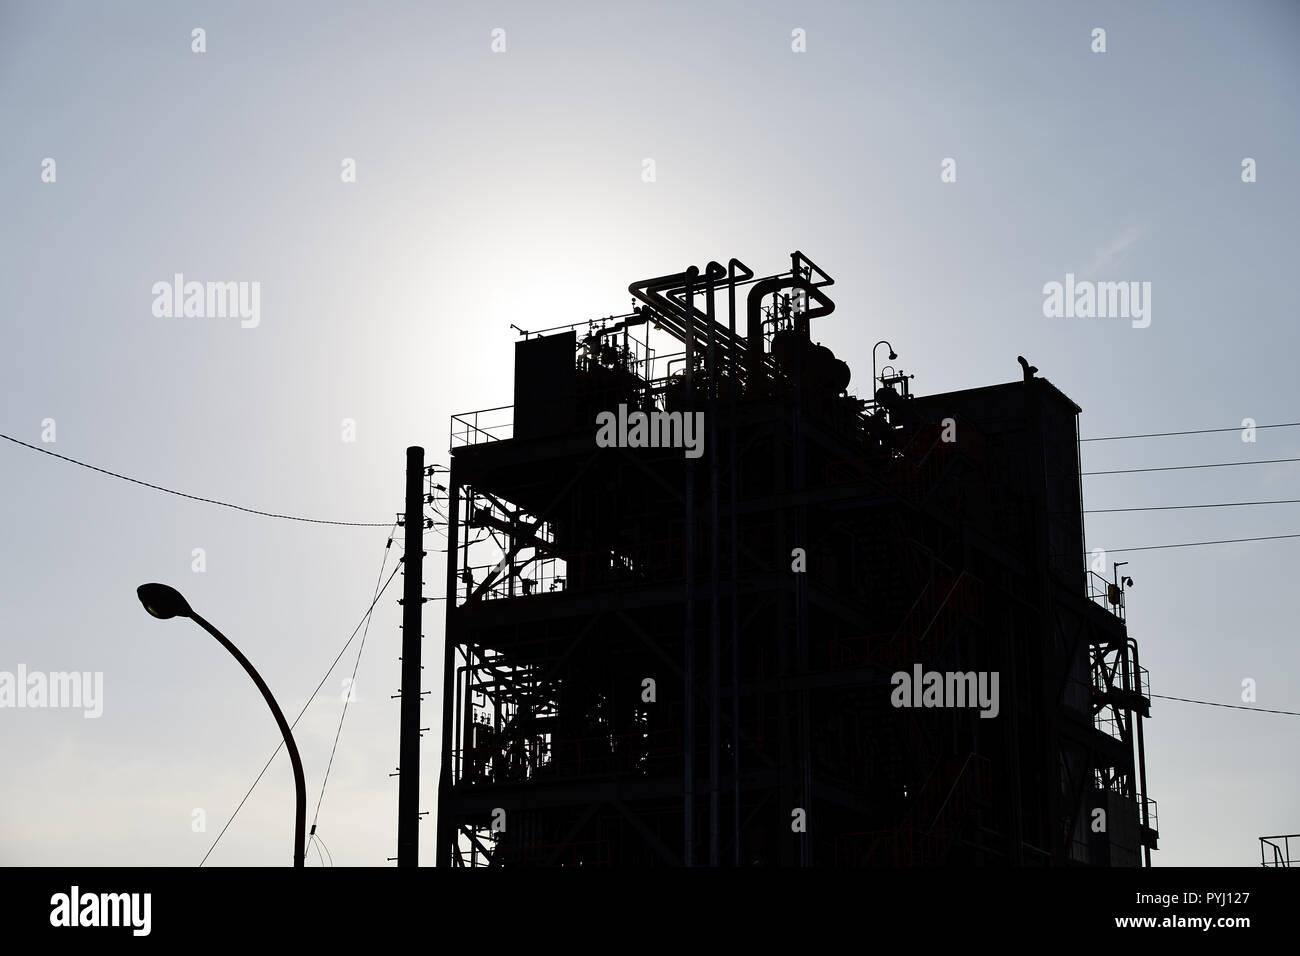 Silhouette of chemical plant; Chidoricho, Kawasaki, Kanagawa Prefecture, Japan - Stock Image